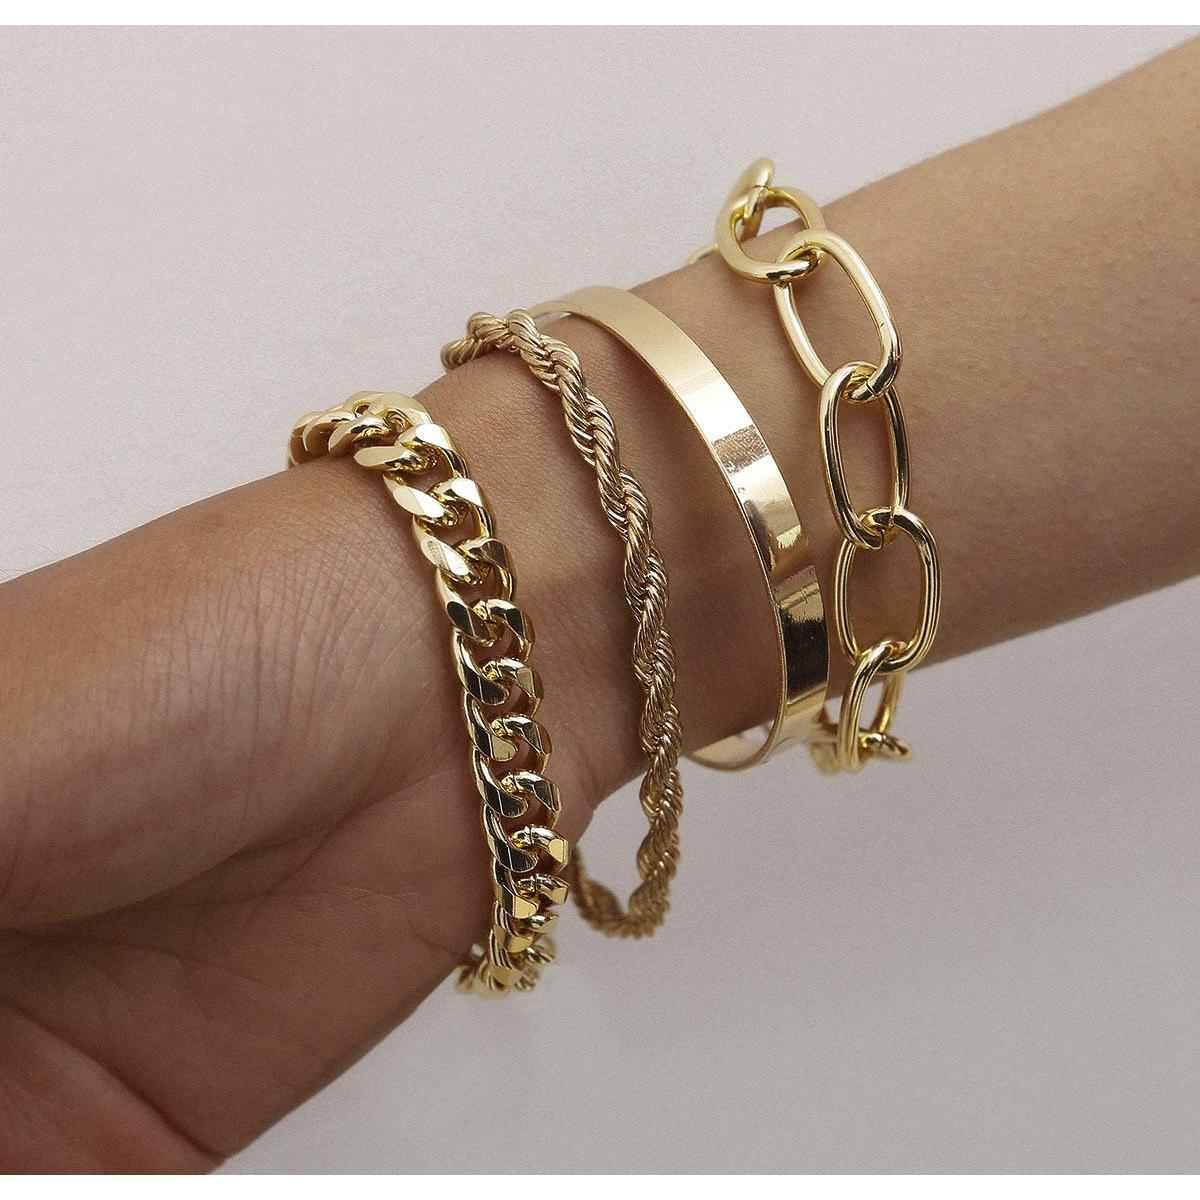 Pulseira de aço conjunto de ouro de ouro para homens e mulheres promessa de festa Championshi Sqcehz Queen66